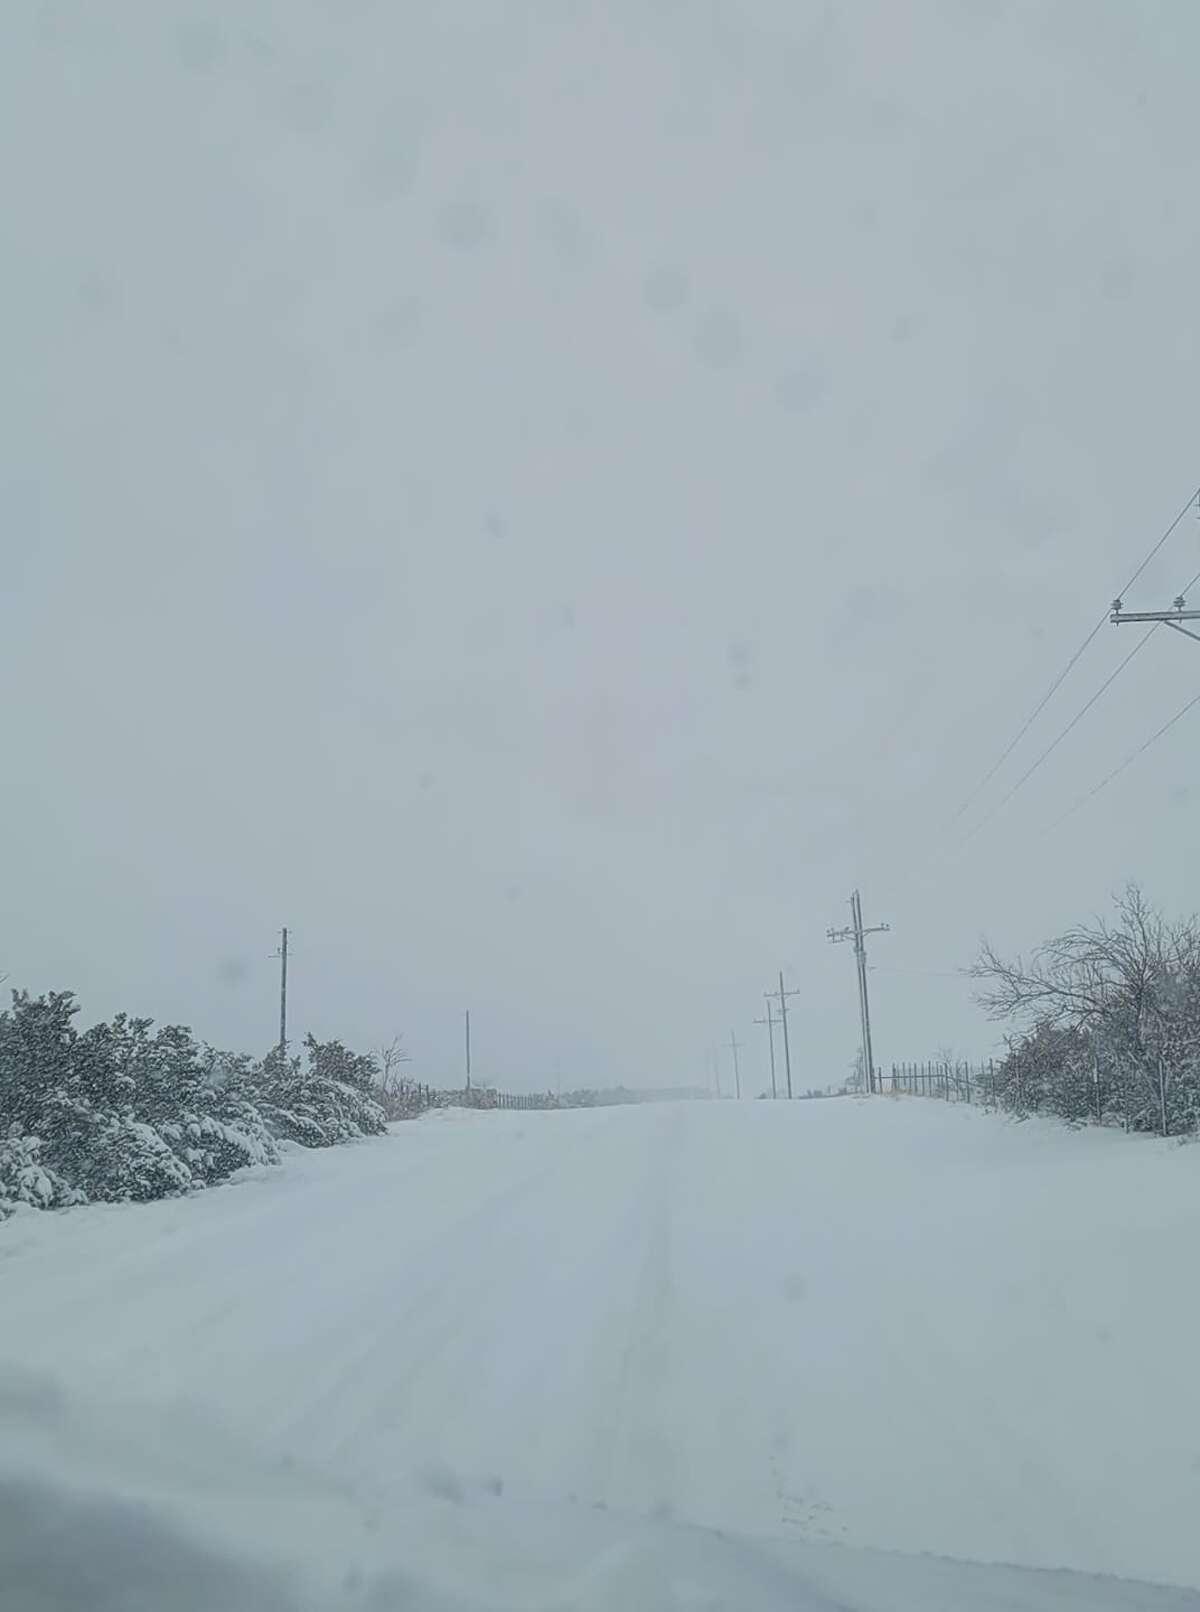 South of Big Spring Wednesday, December 31, 2020.